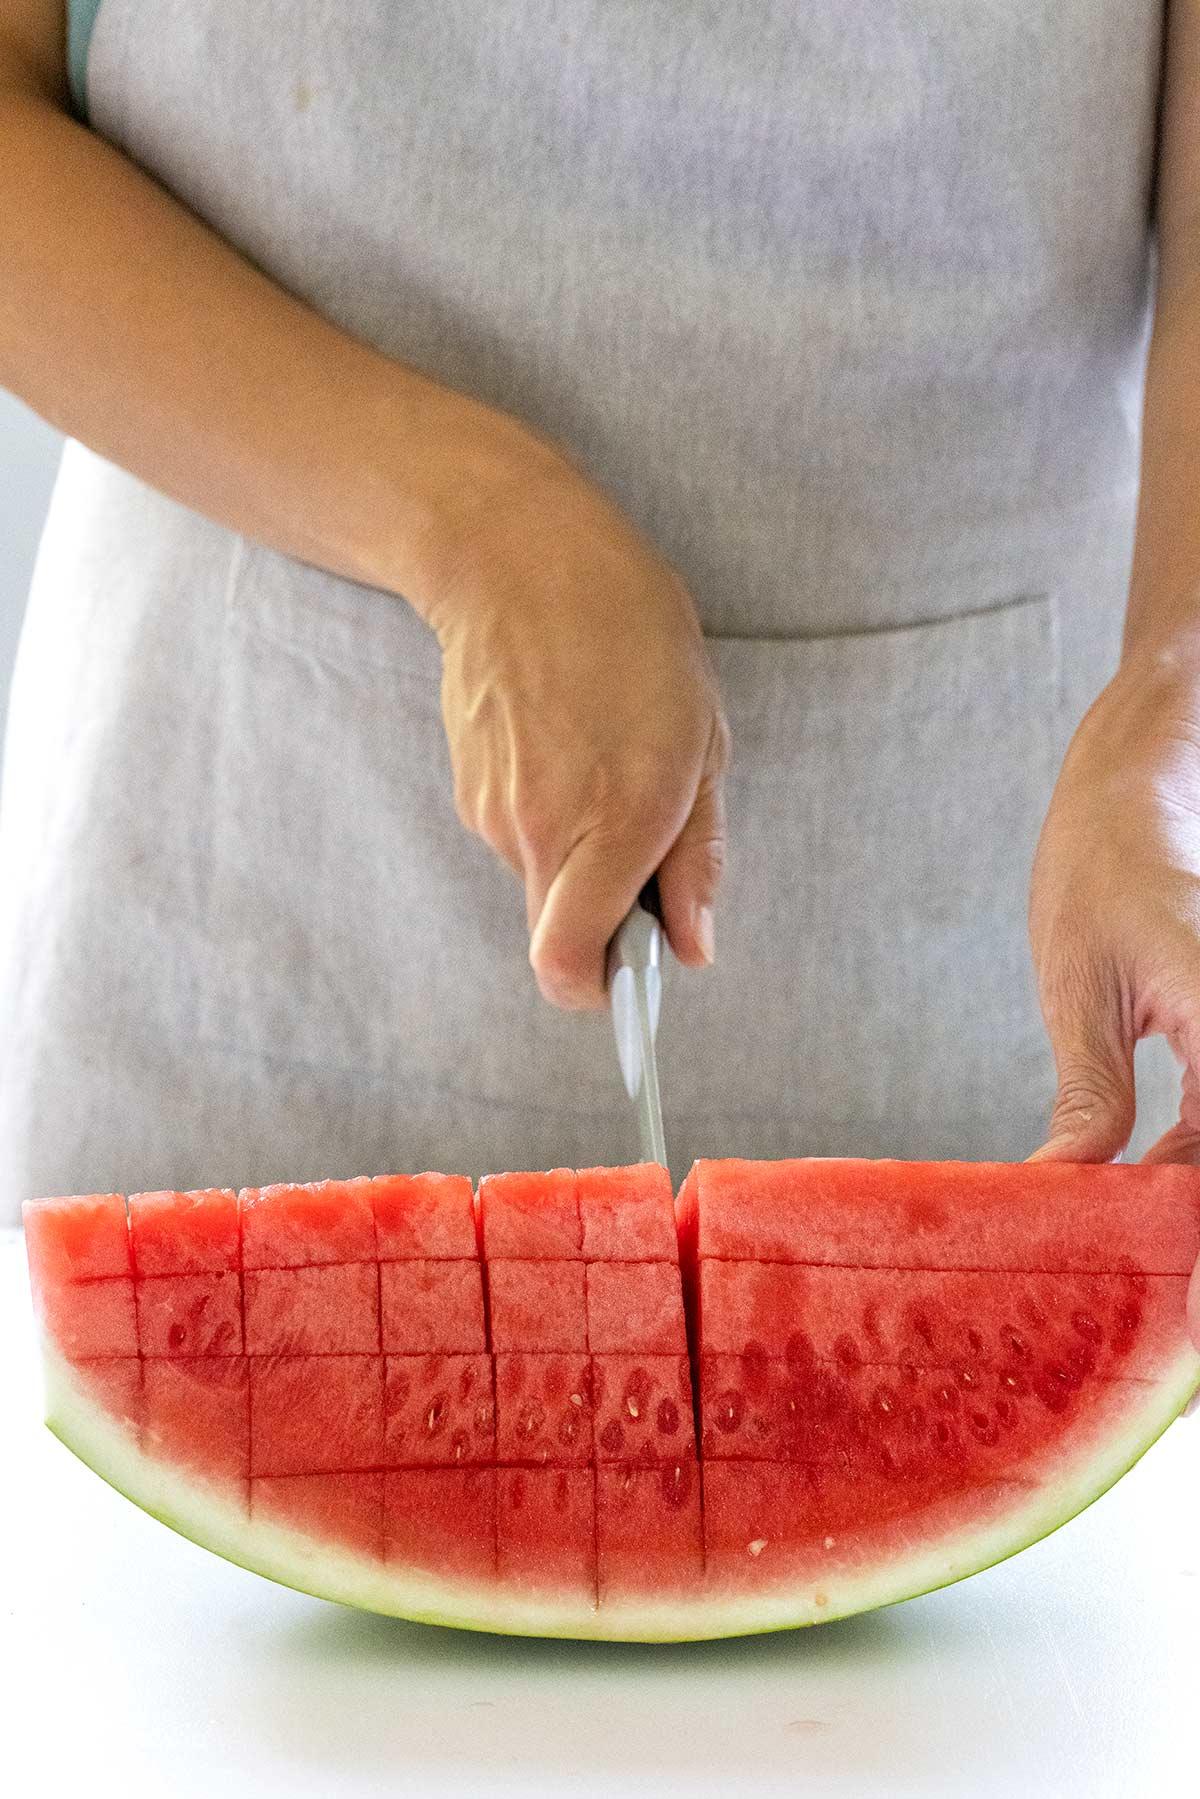 cutting watermelon into a crosshatch